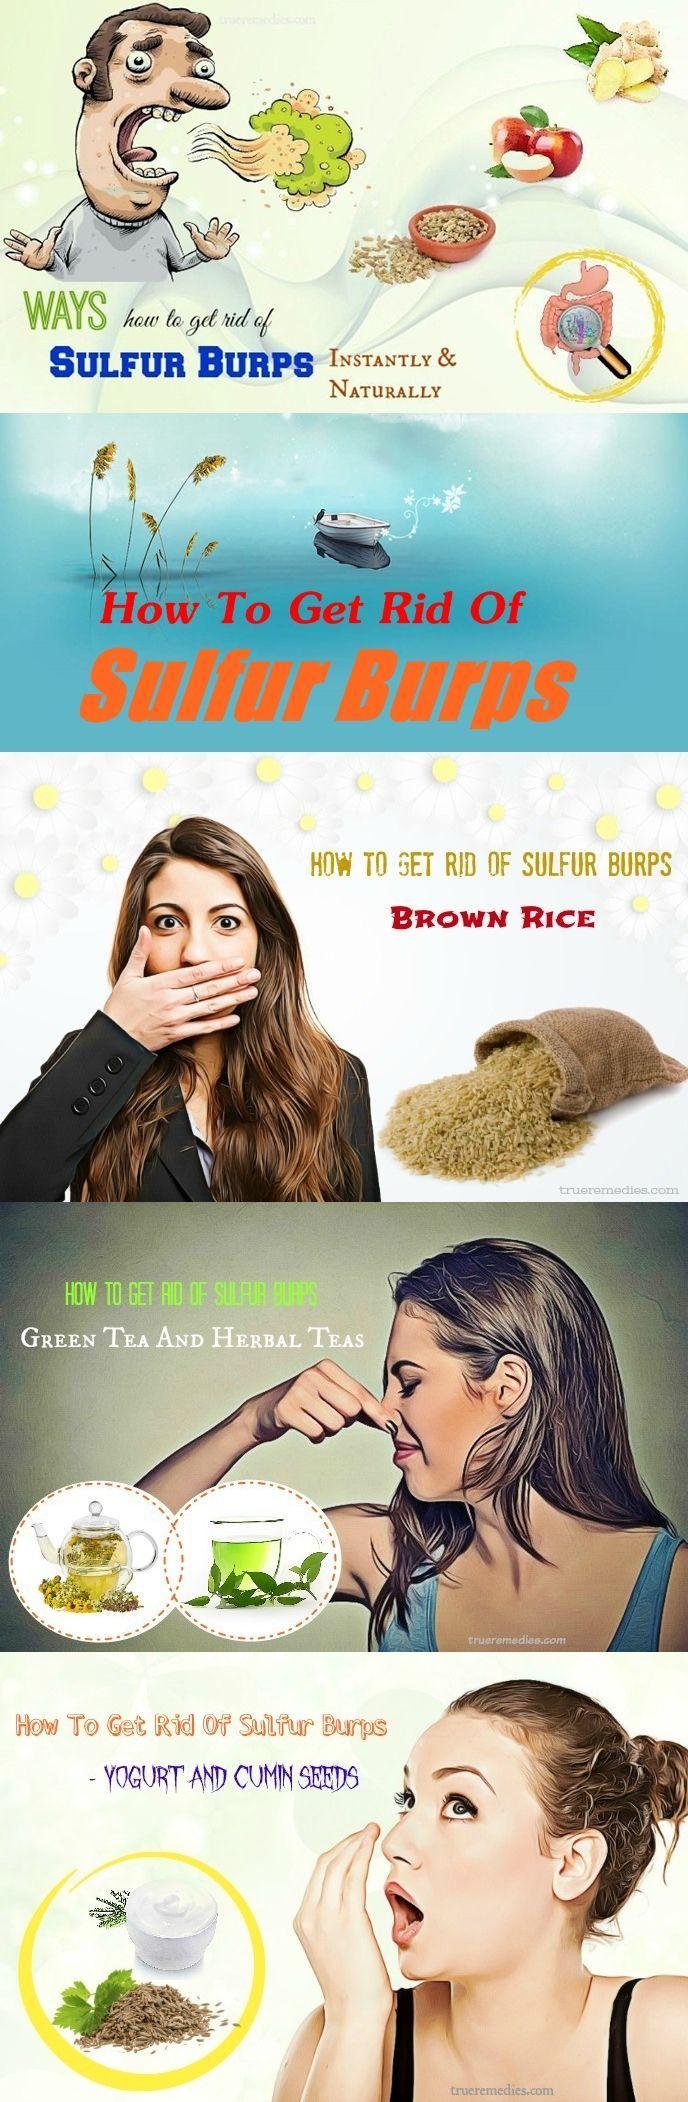 How To Get Rid Of Sulfur Burps Sulphur Burps Burp Rotten Egg